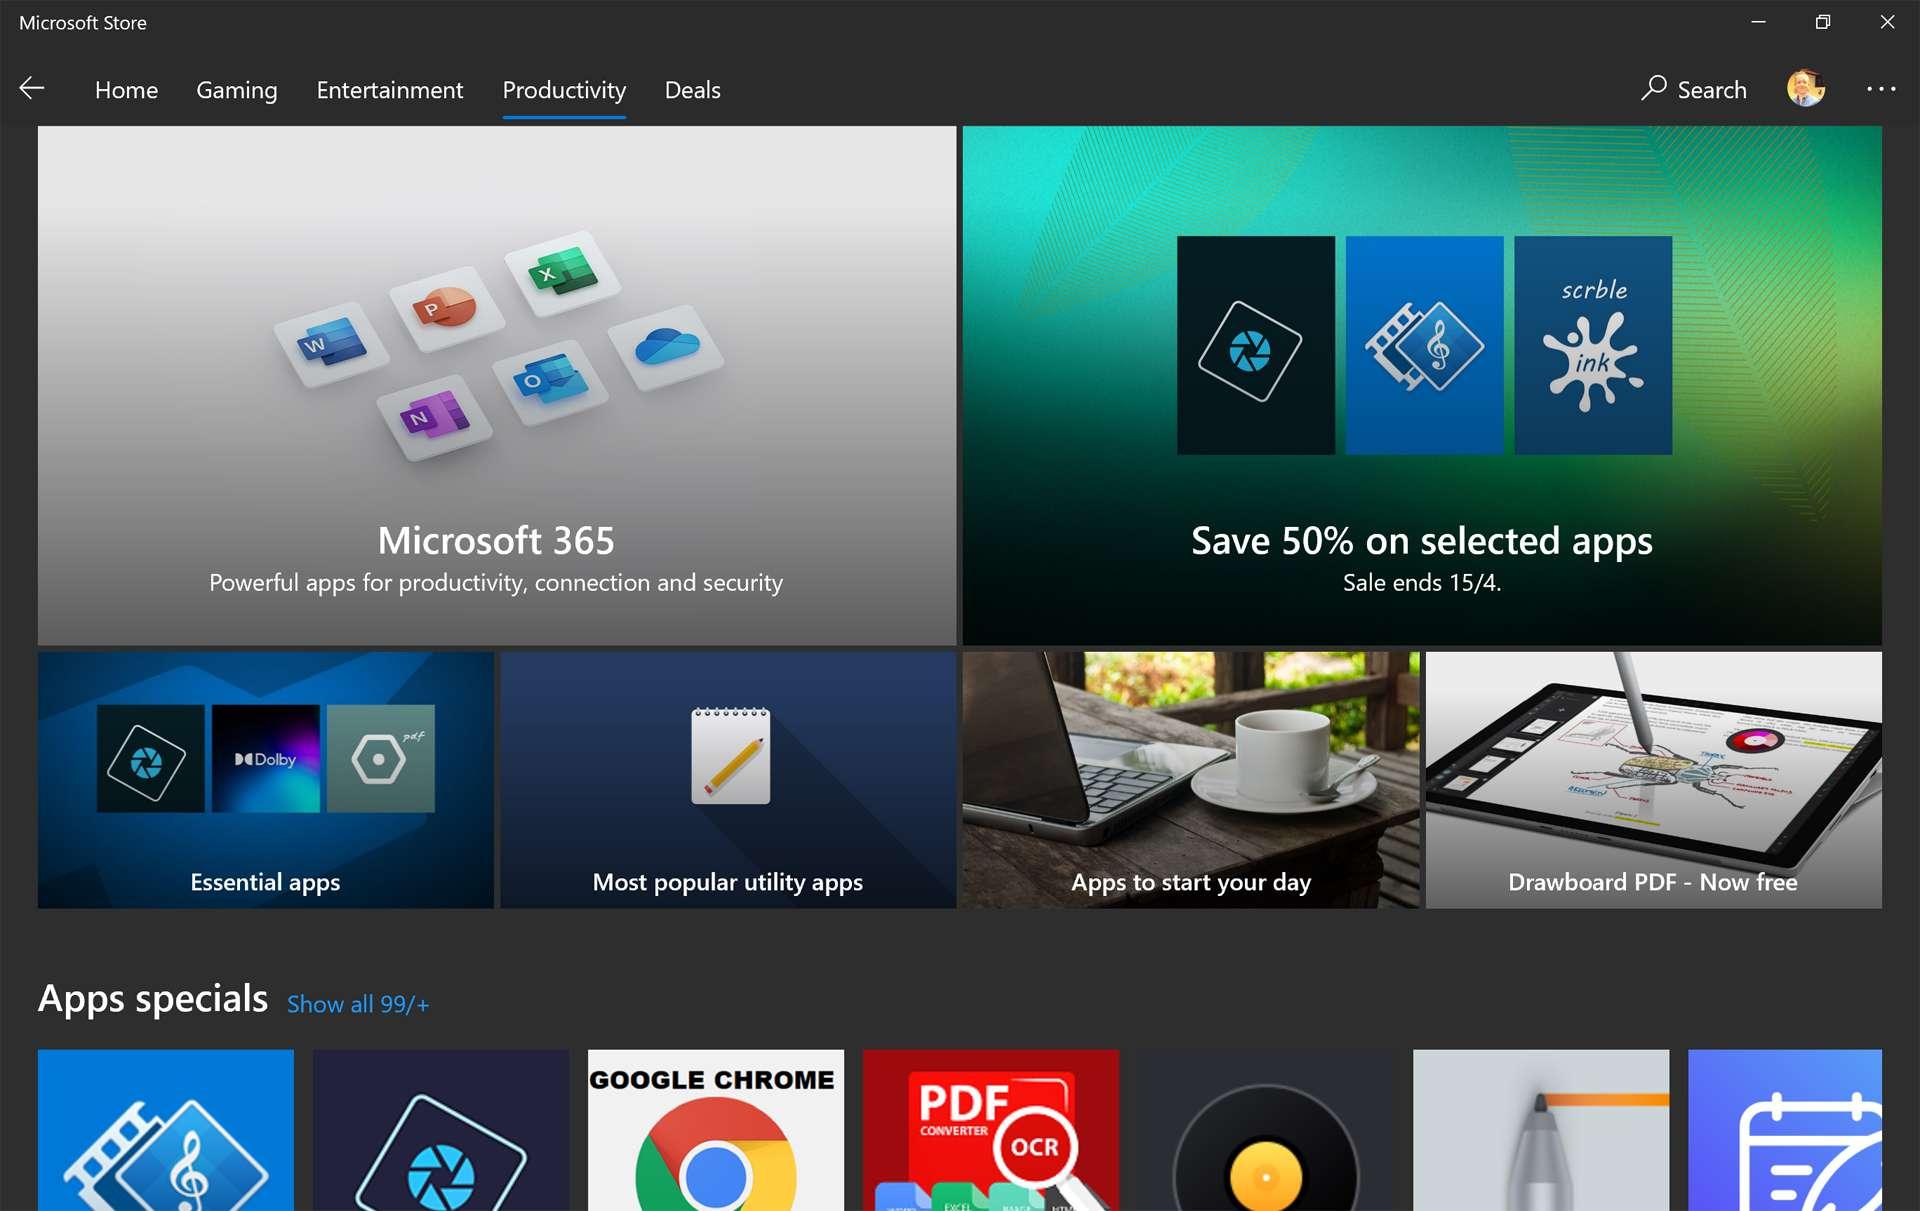 Windows 10 Microsoft Store app store,